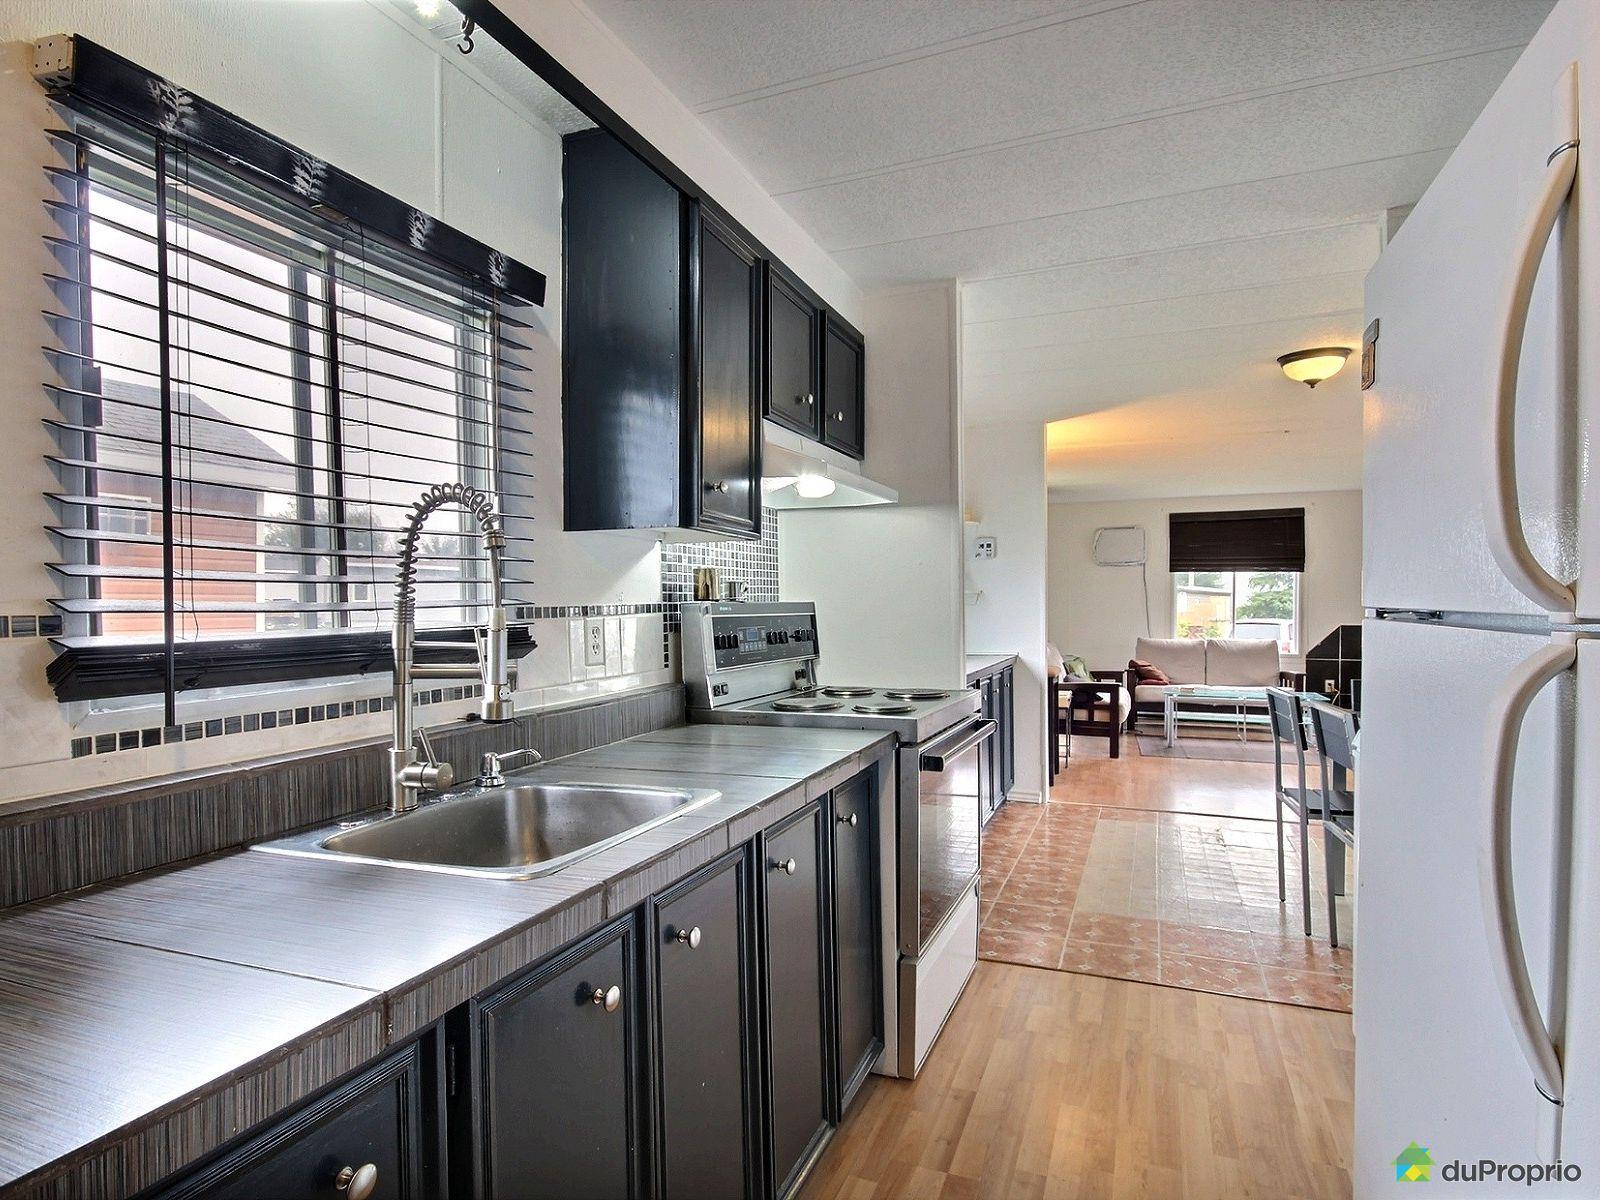 maison vendre l vis 24 4740 boulevard guillaume couture immobilier qu bec duproprio 526122. Black Bedroom Furniture Sets. Home Design Ideas